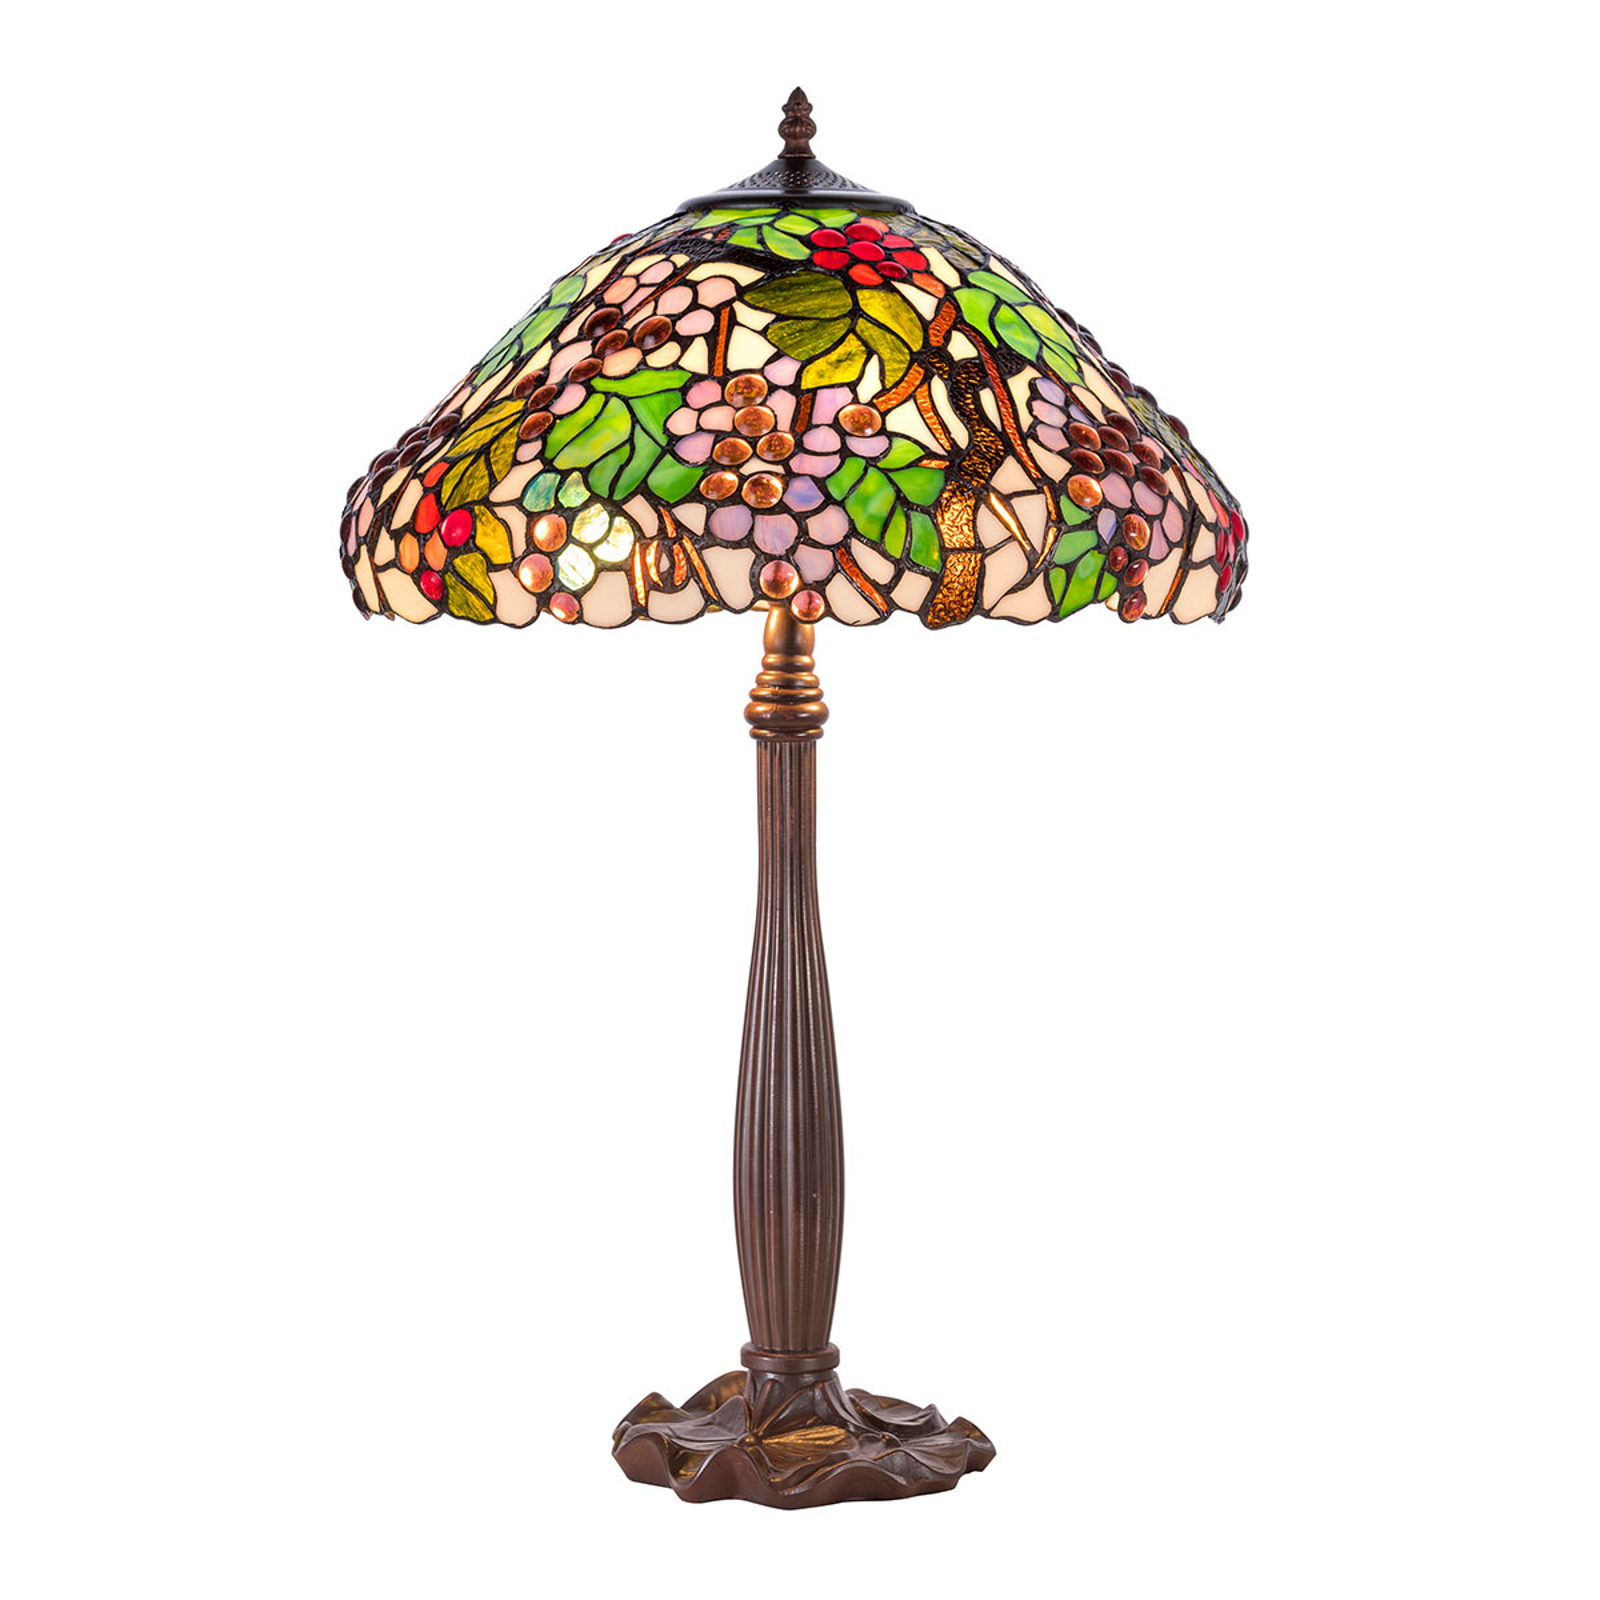 Tafellamp KT9810+P927 in Tiffany stijl